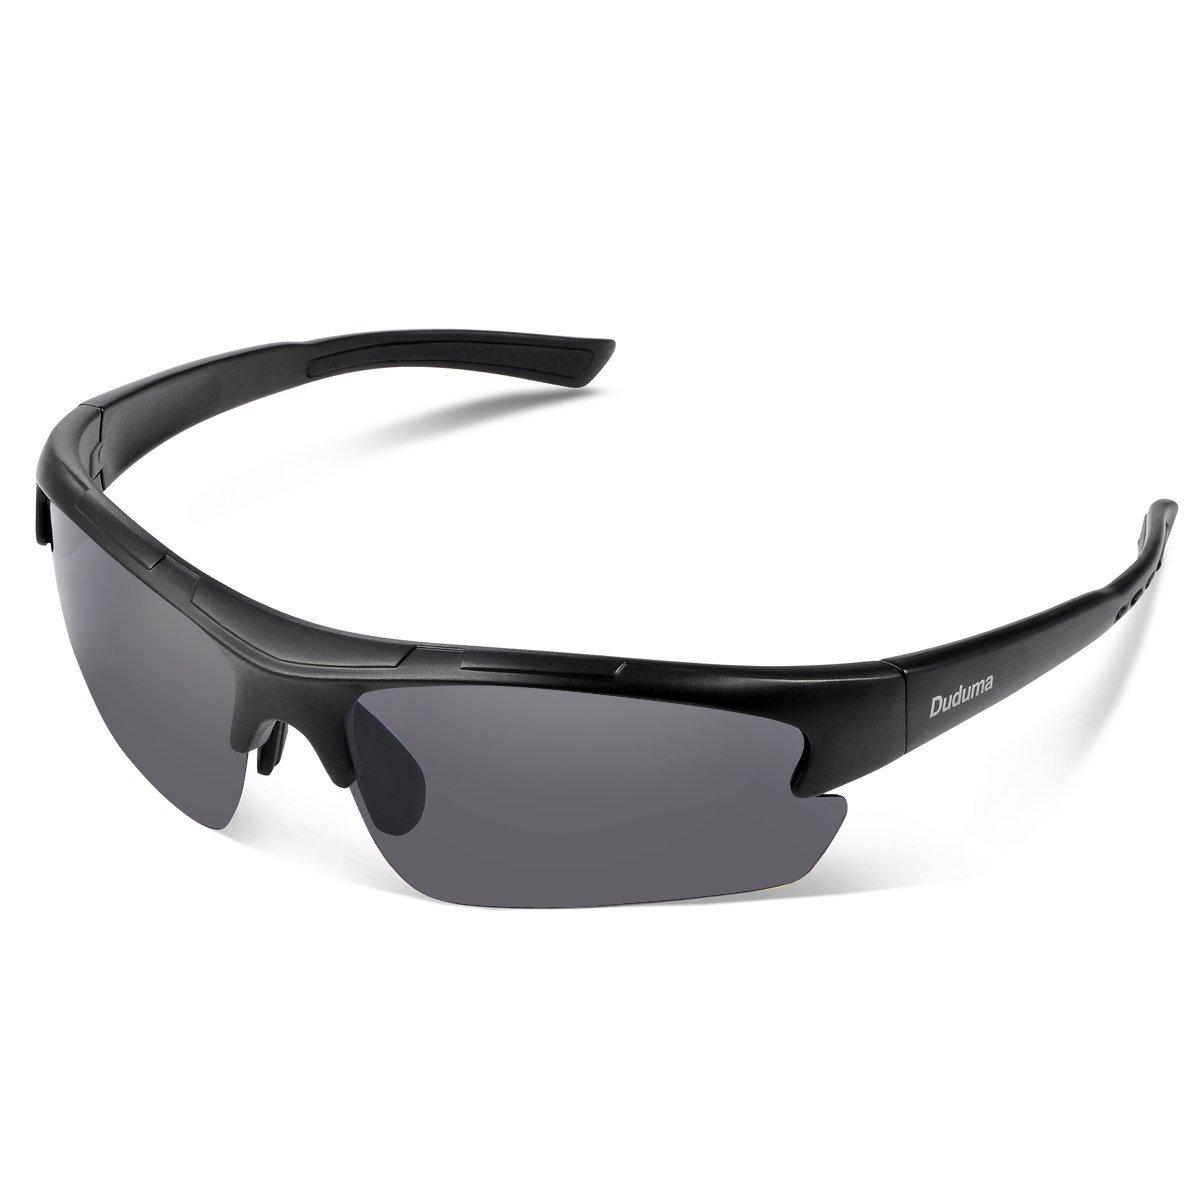 Polarized Designer Sunglasses for Baseball Cycling Fishing Golf Superlight Unbreakable Frame $9.99AC NT